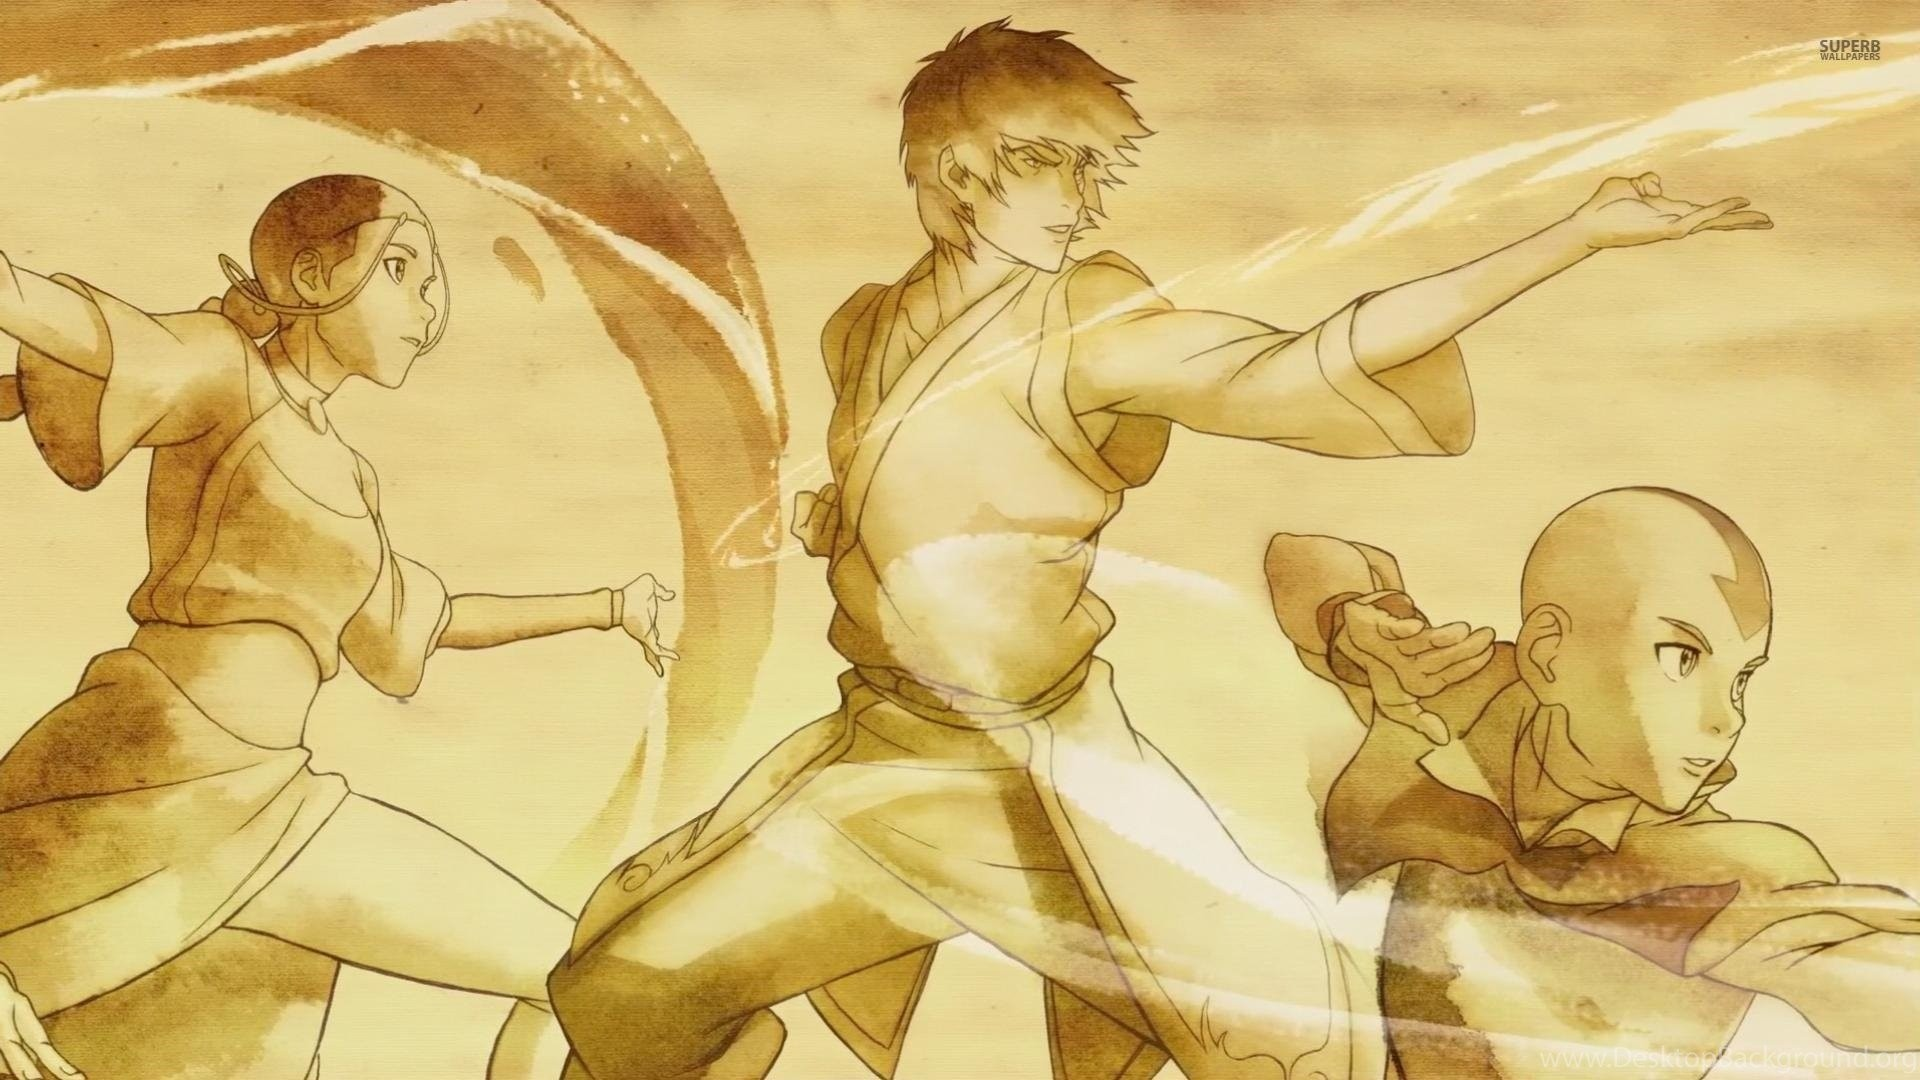 Avatar The Last Airbender wallpaper photo hd